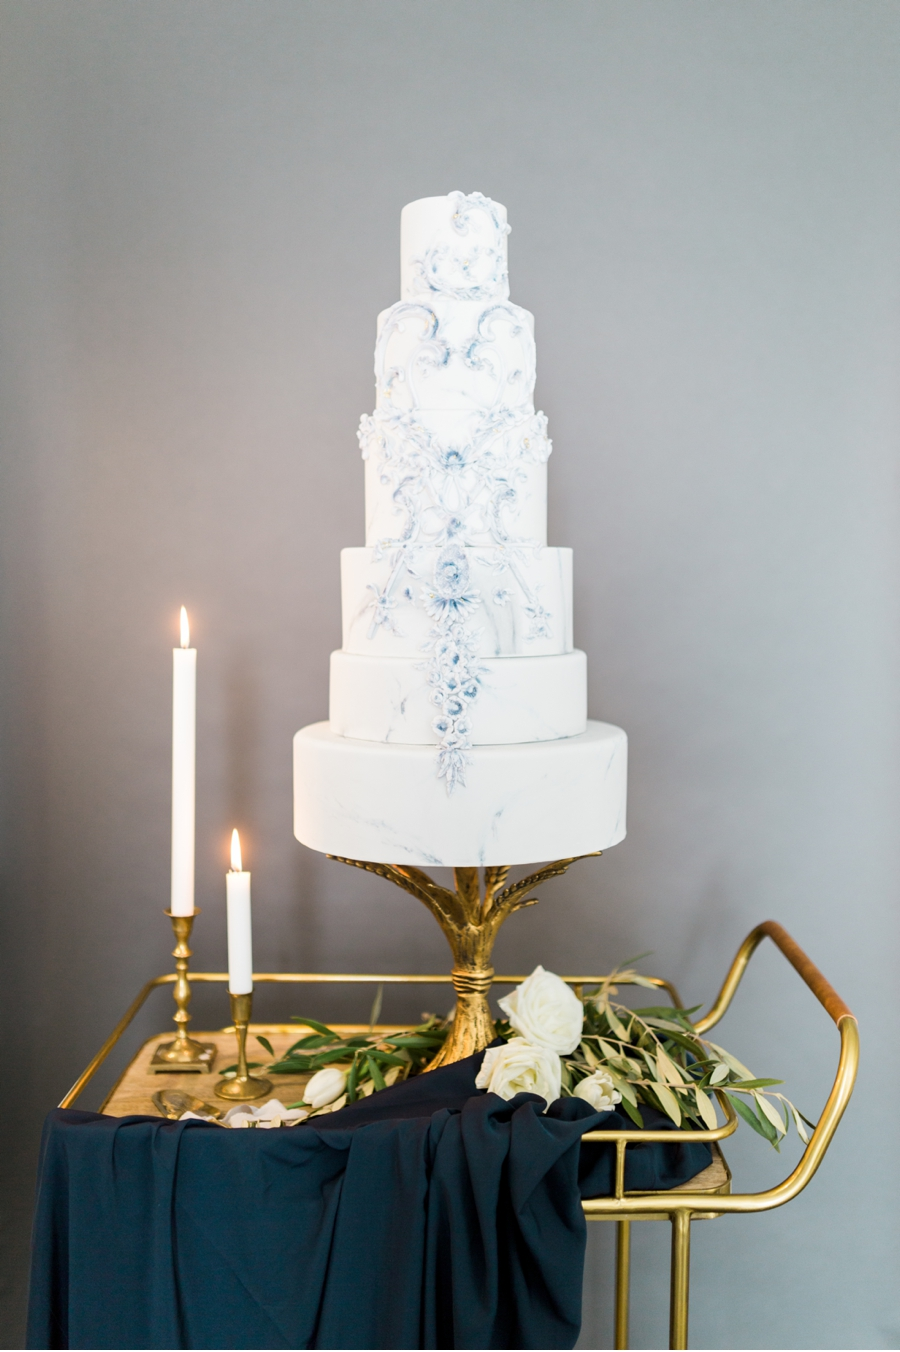 White-Tiered-Wedding-Cake-on-Bar-Cart